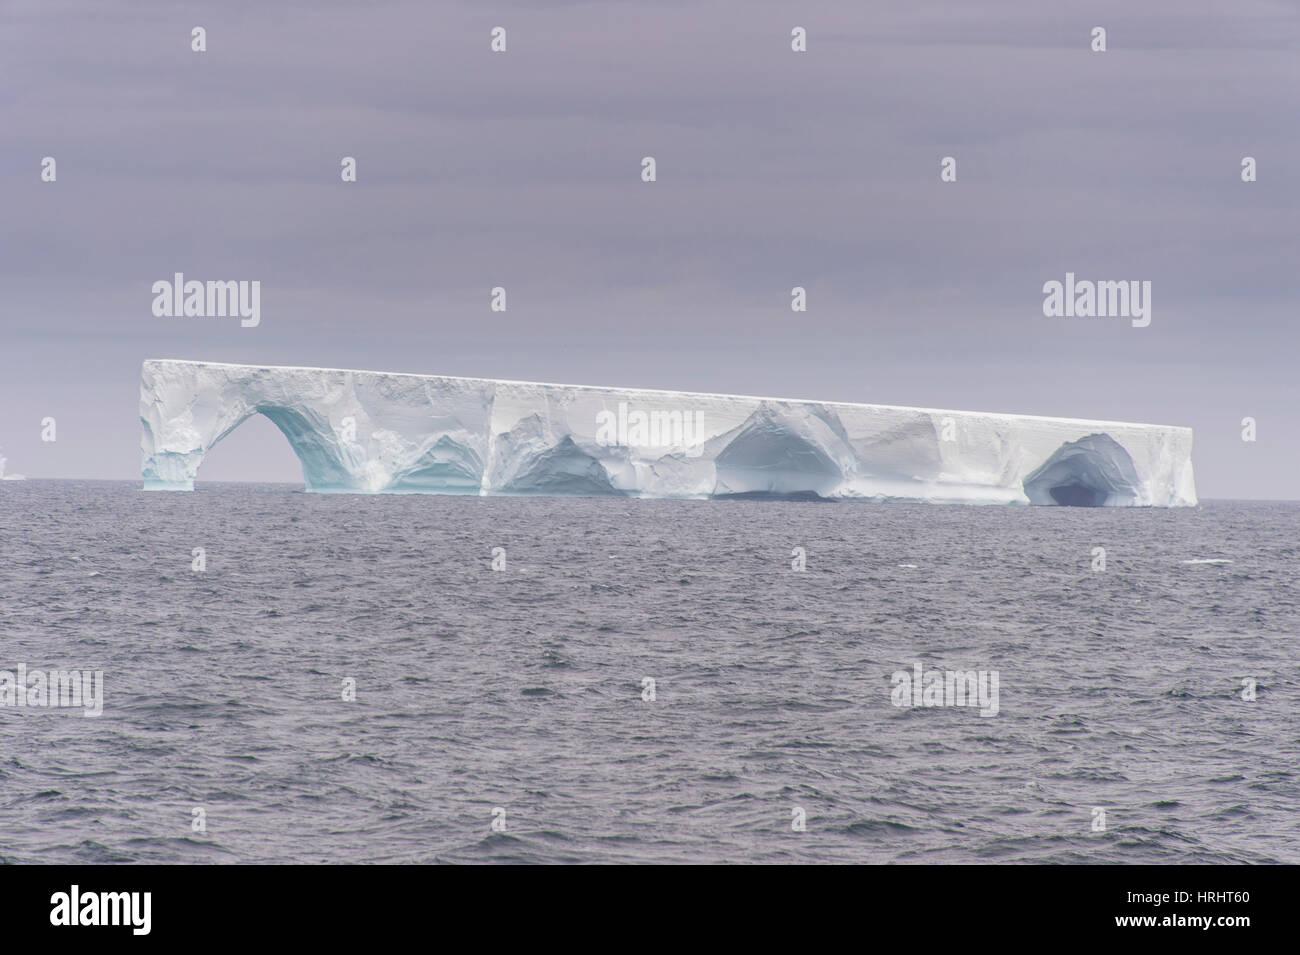 Floating iceberg, Elephant Island, South Shetland Islands, Antarctica, Polar Regions - Stock Image